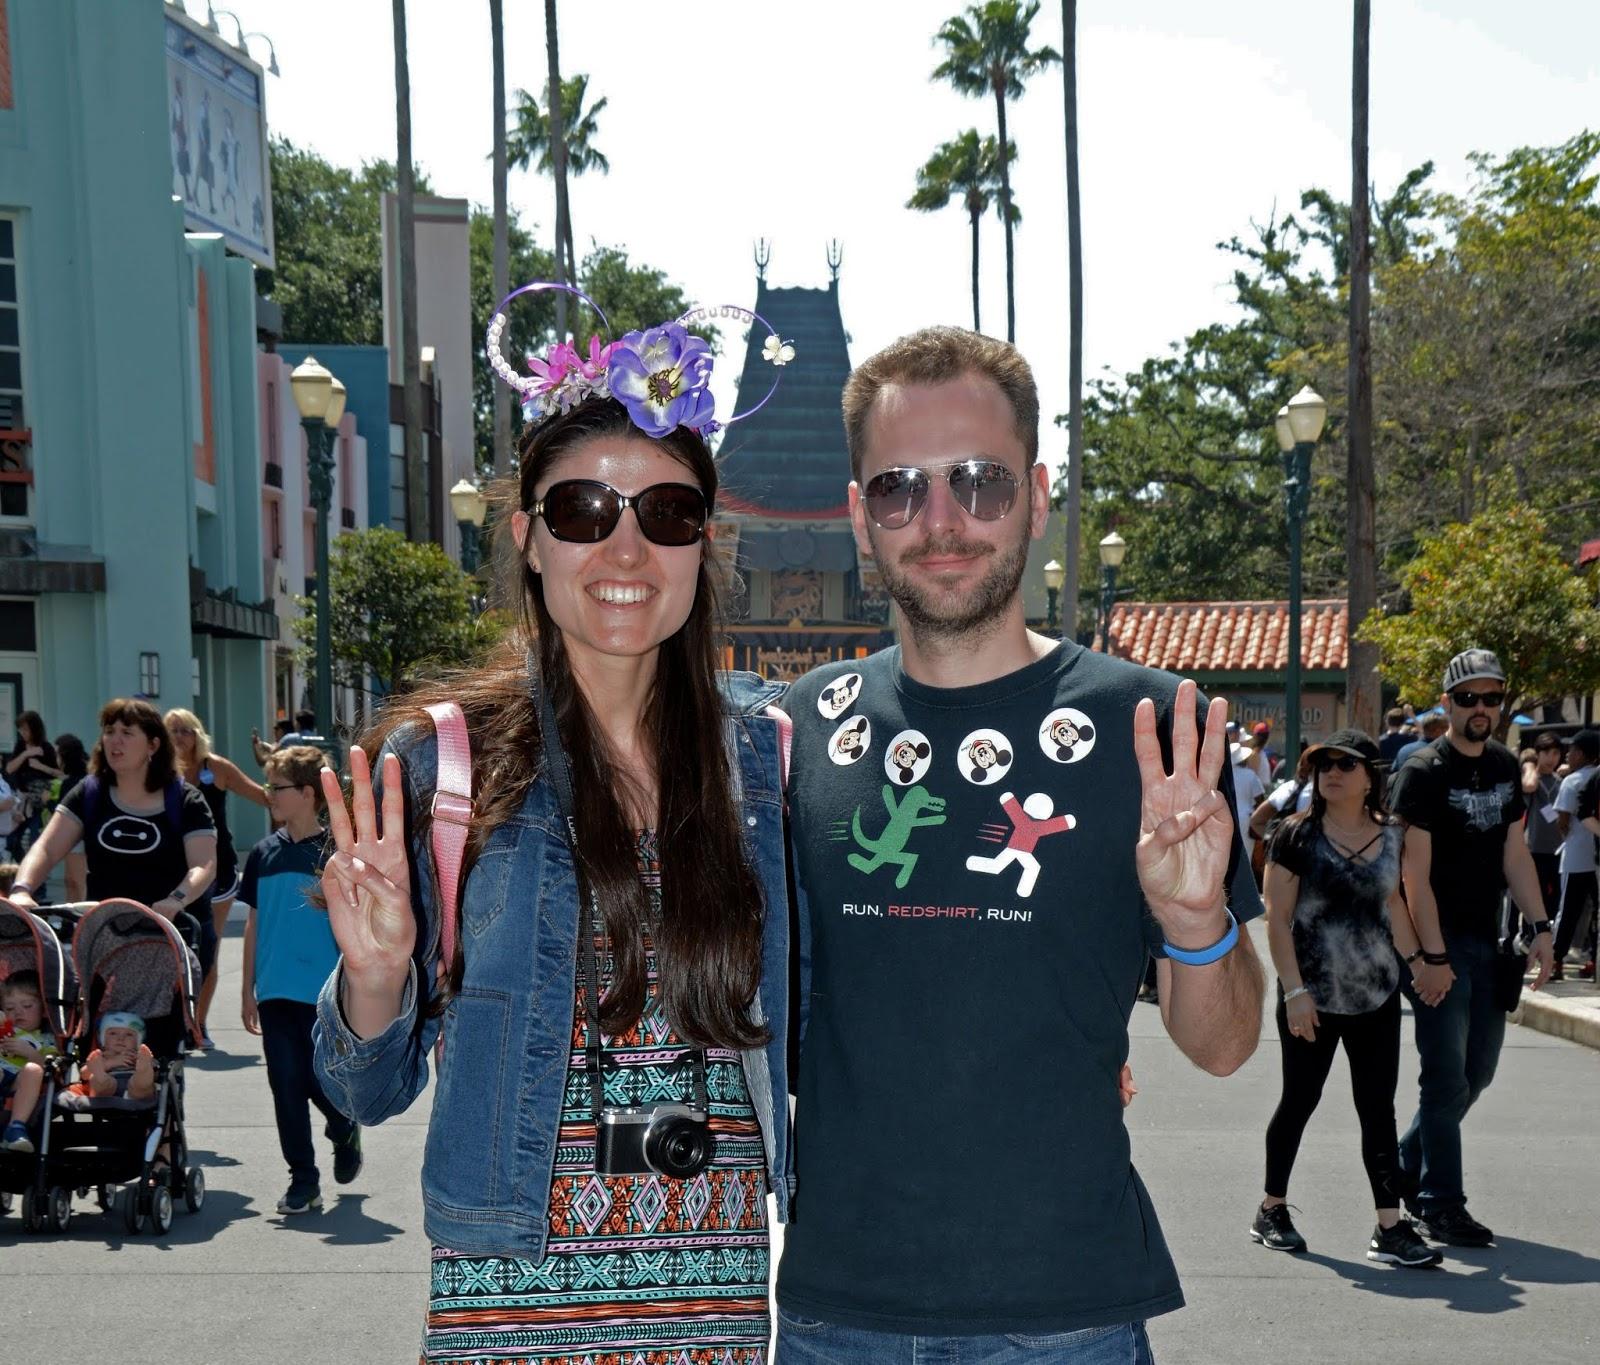 Our third park of the Walt Disney World 4 park challenge: Hollywood Studios